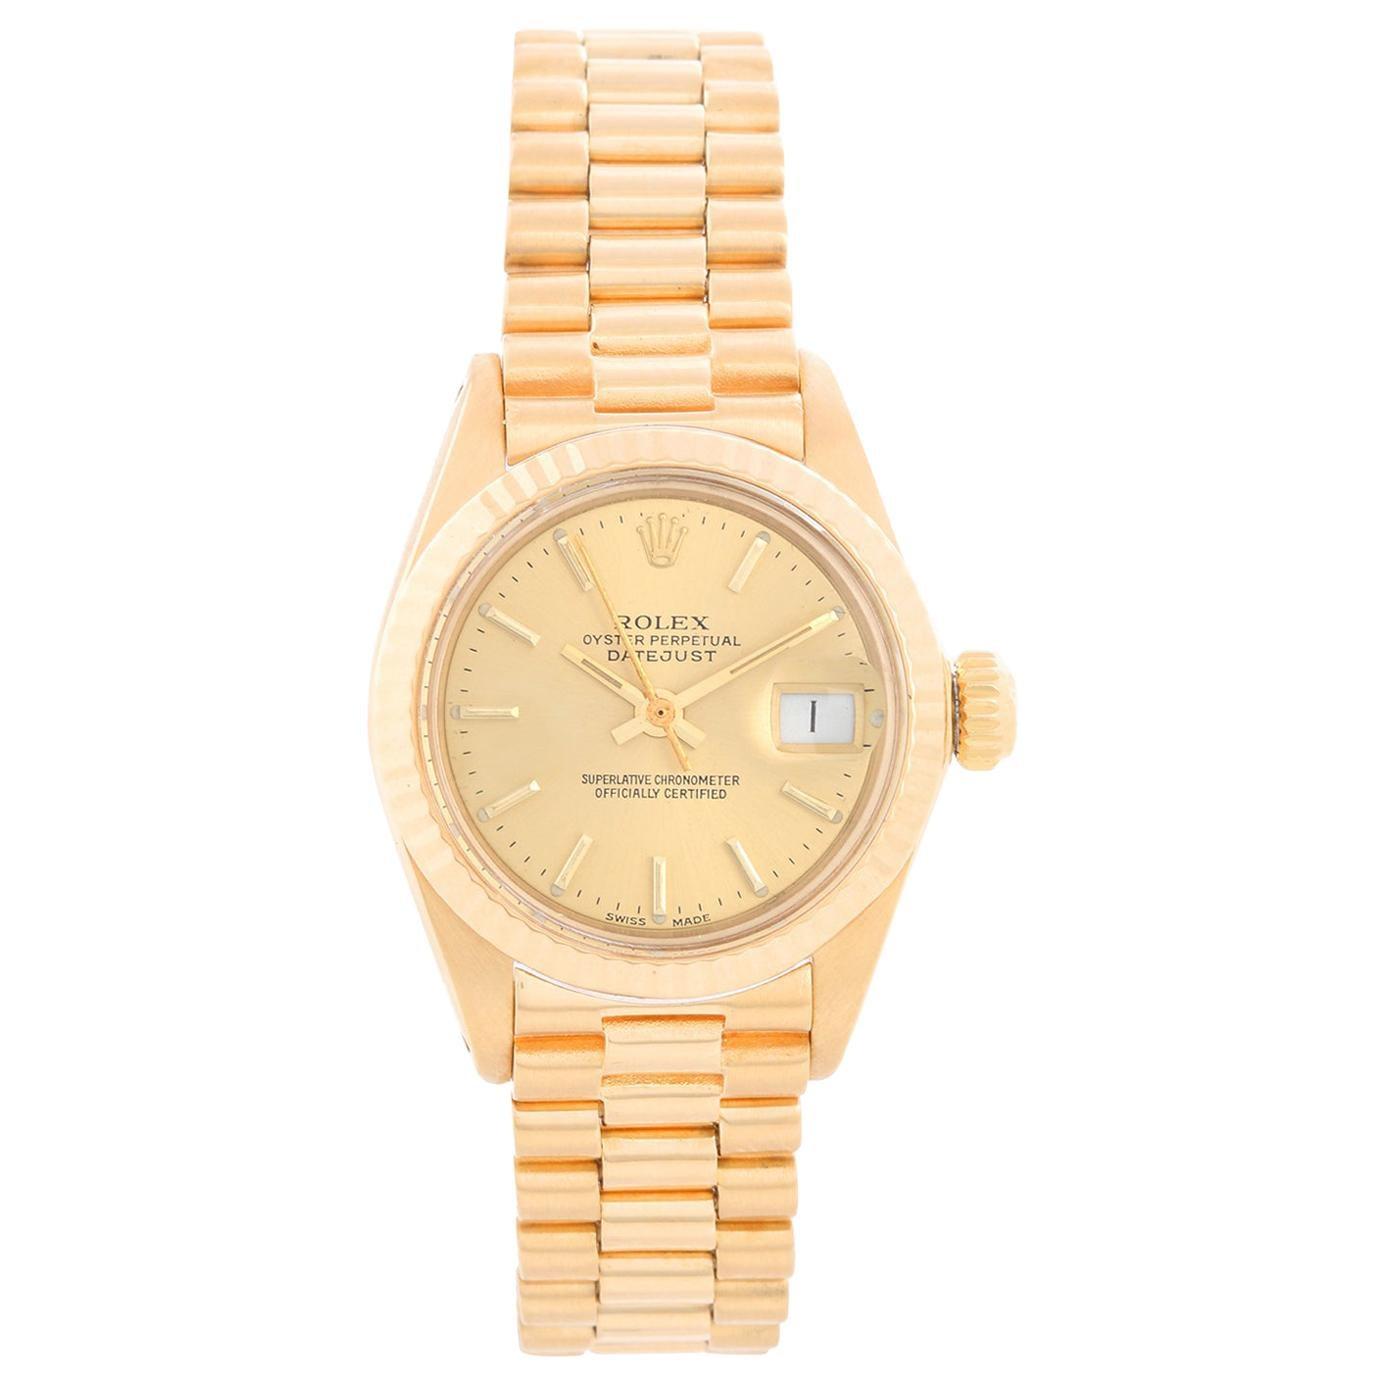 Rolex Ladies President 18k Yellow Gold 6917 Watch